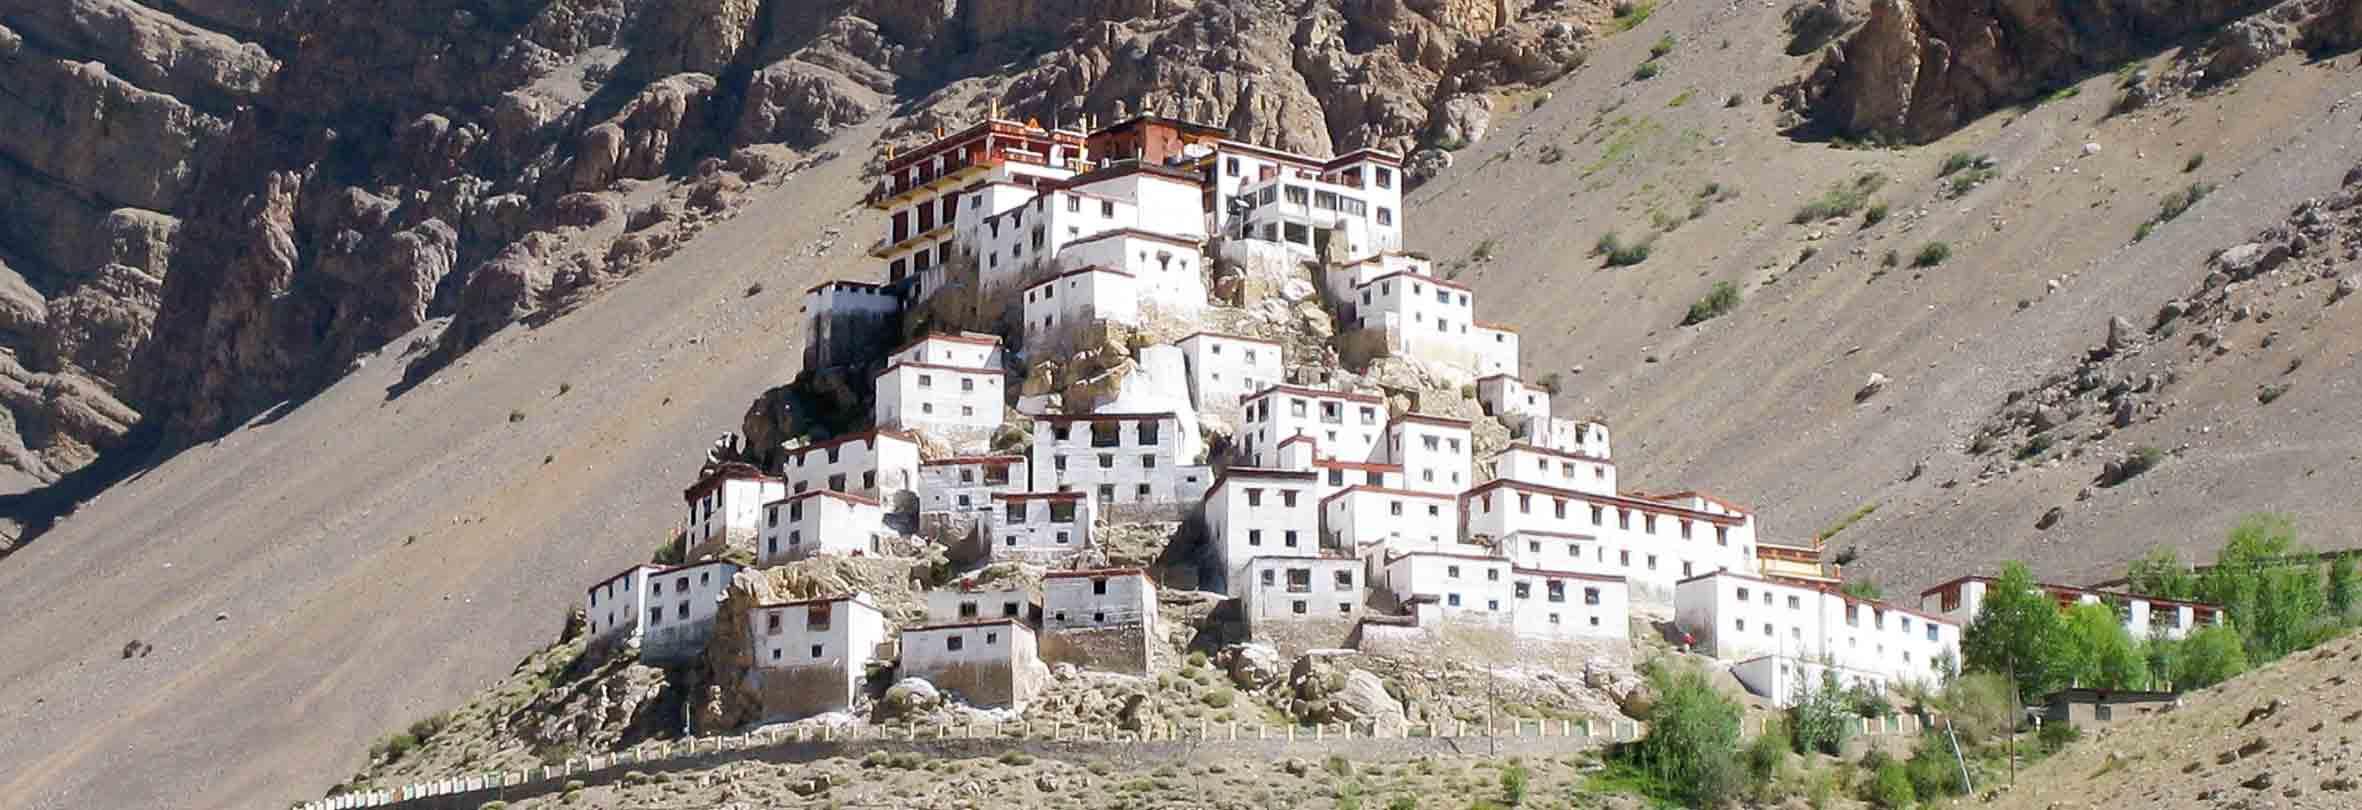 Kloster Likir in Ladakh